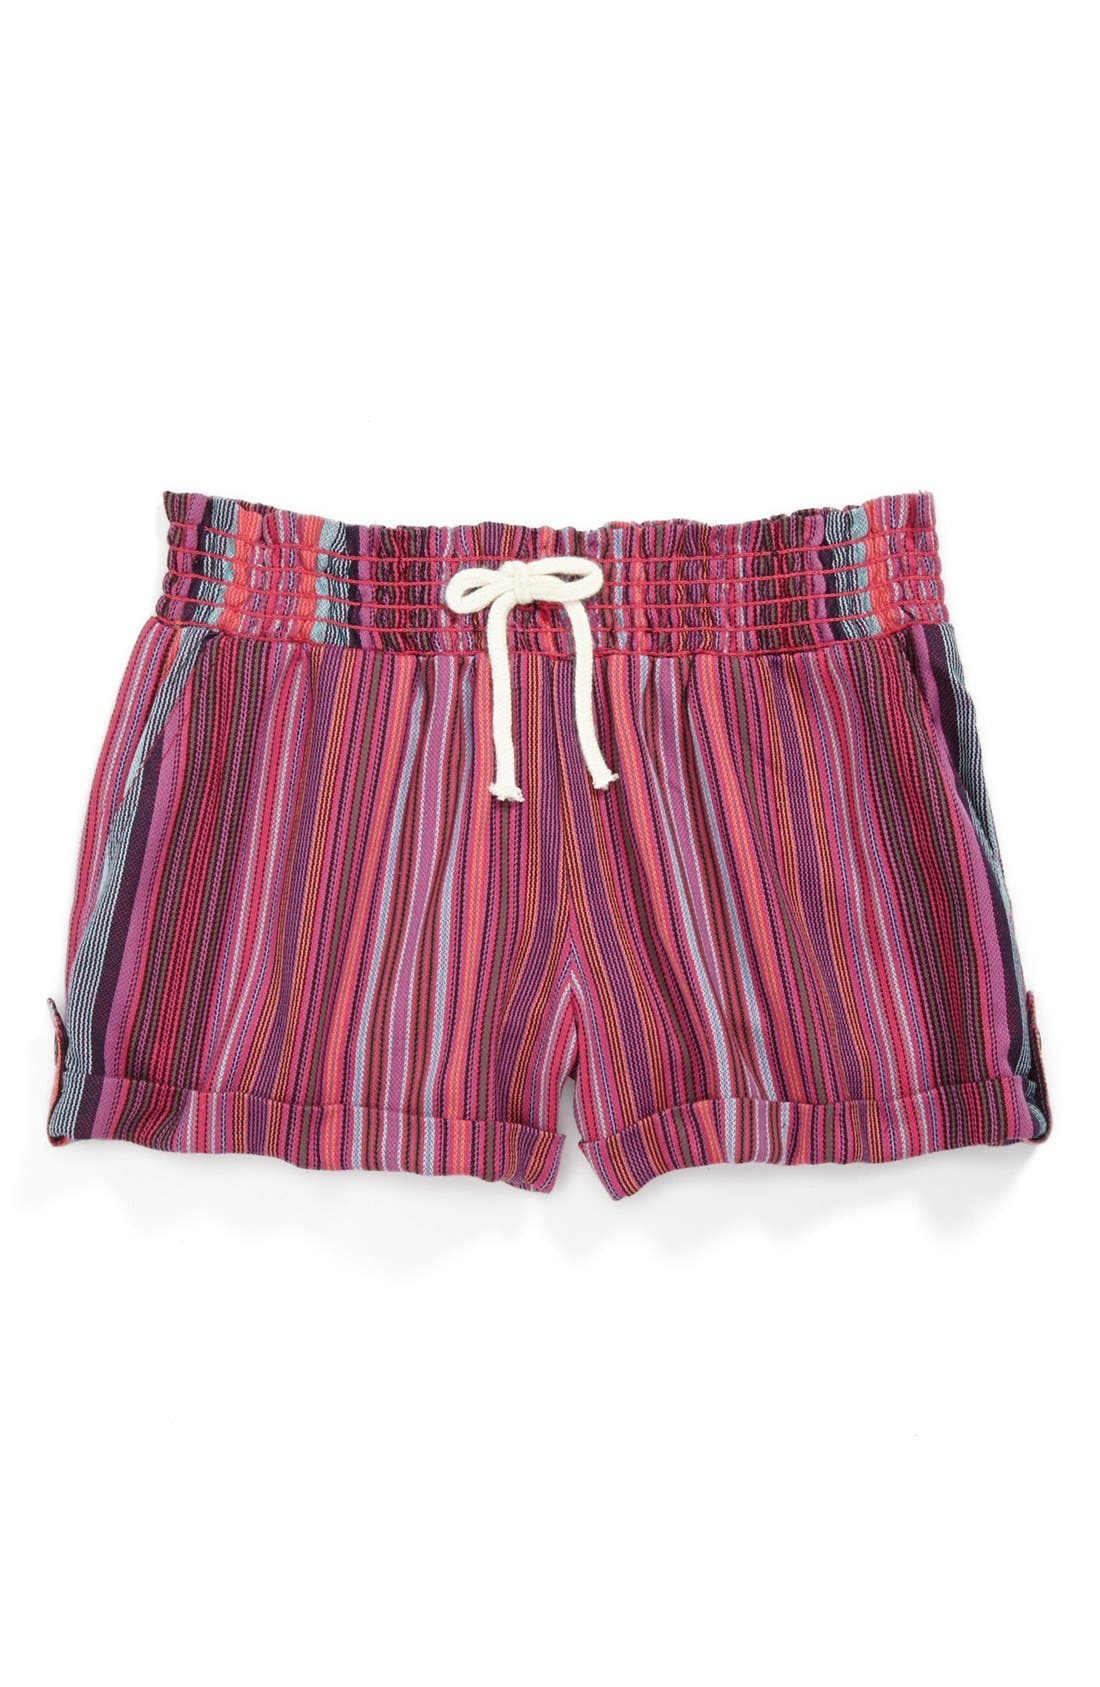 Alternate Image 1 Selected - Roxy 'Beach Comber' Yarn Dye Shorts (Big Girls)